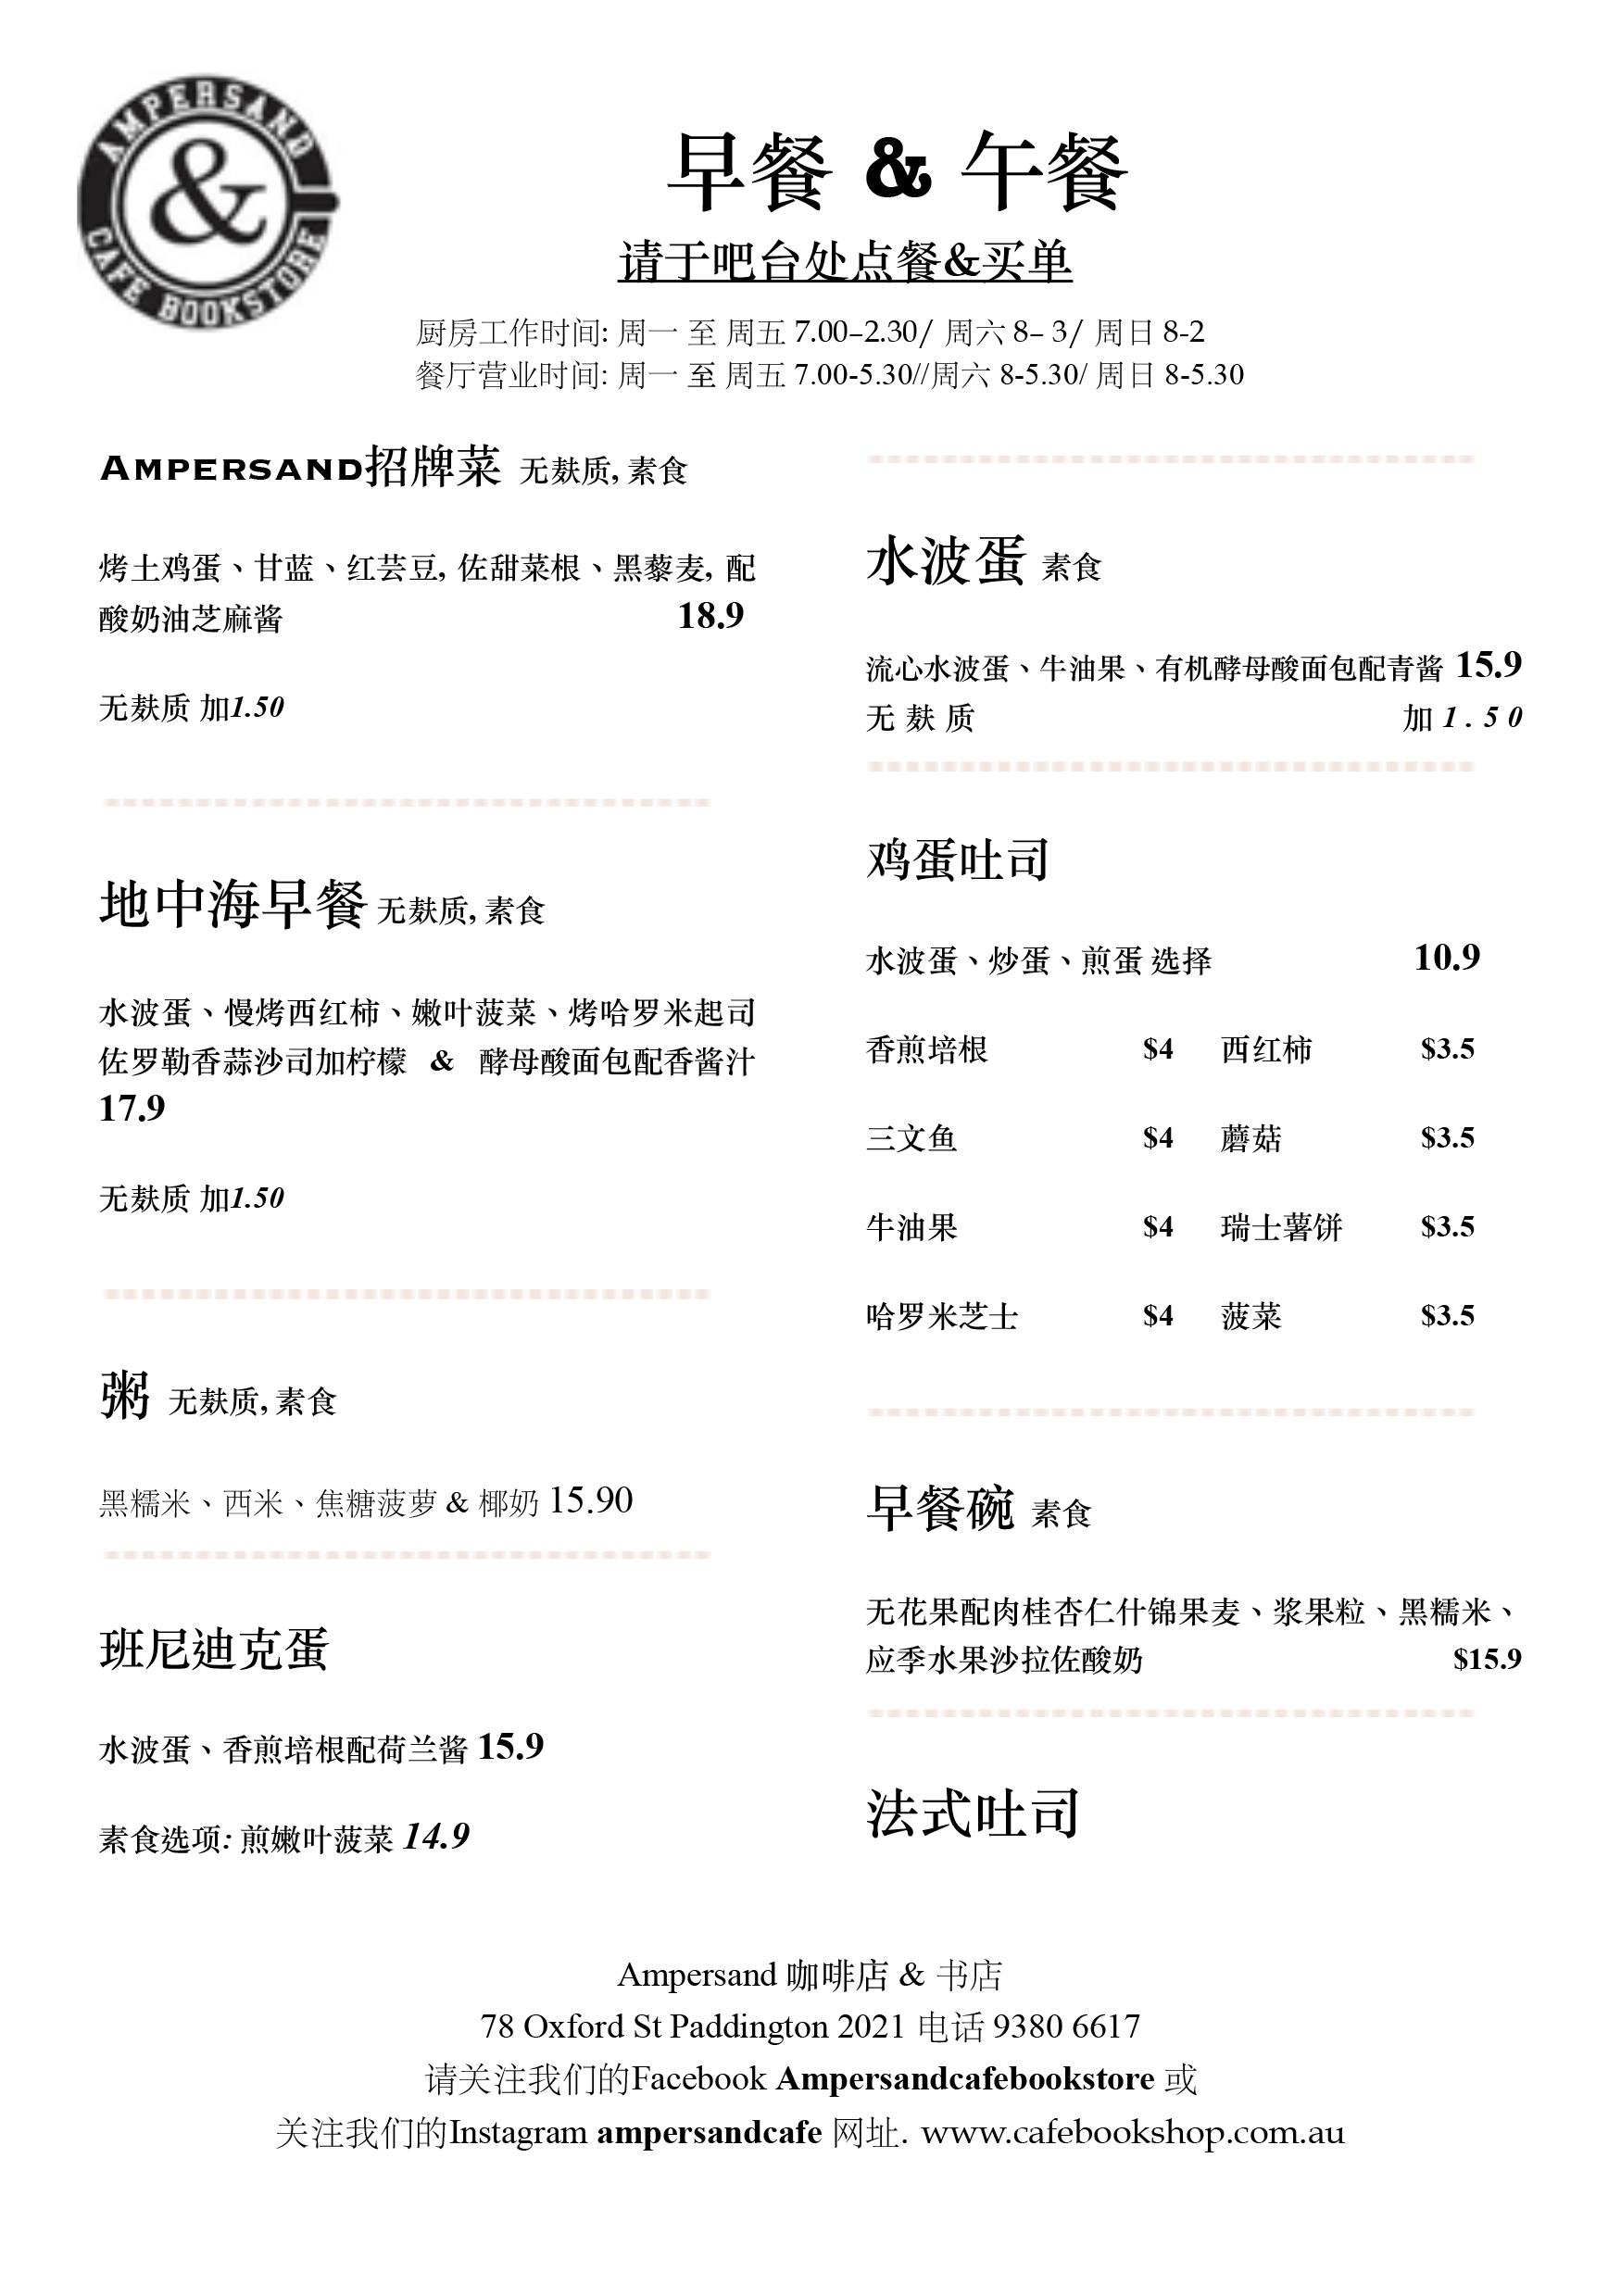 AMPERSAND-MENU-CH-1.png